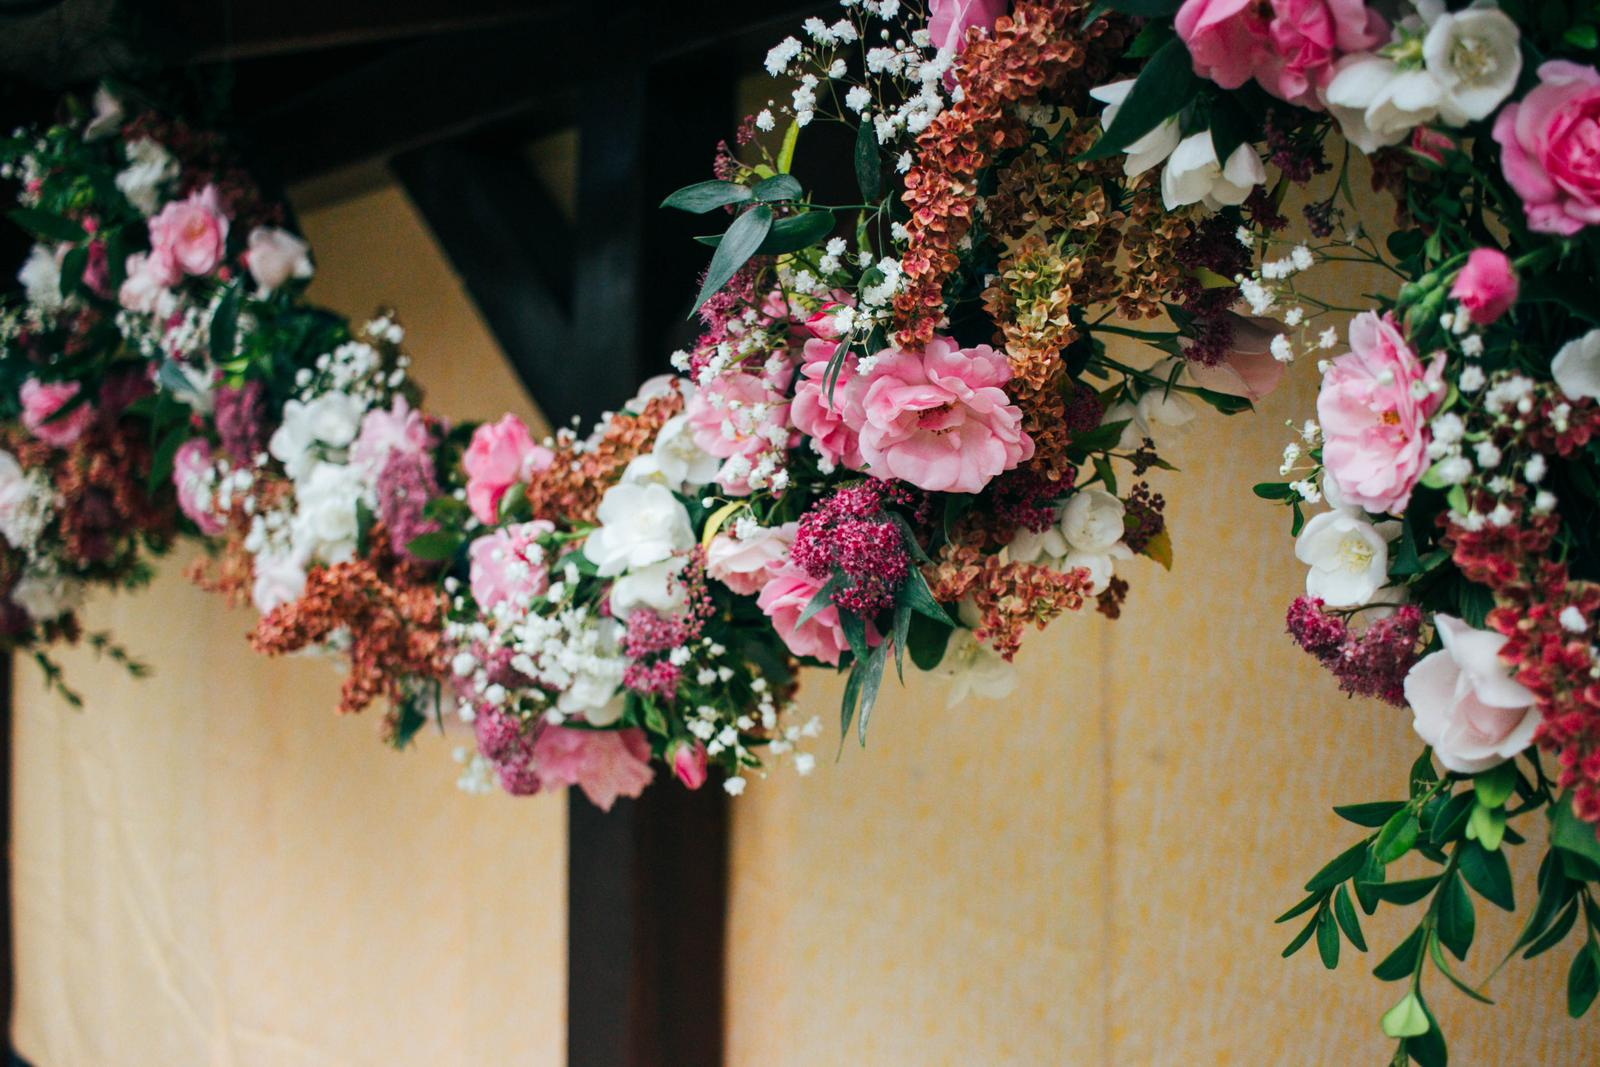 Bridal Shower - Obrázok č. 7